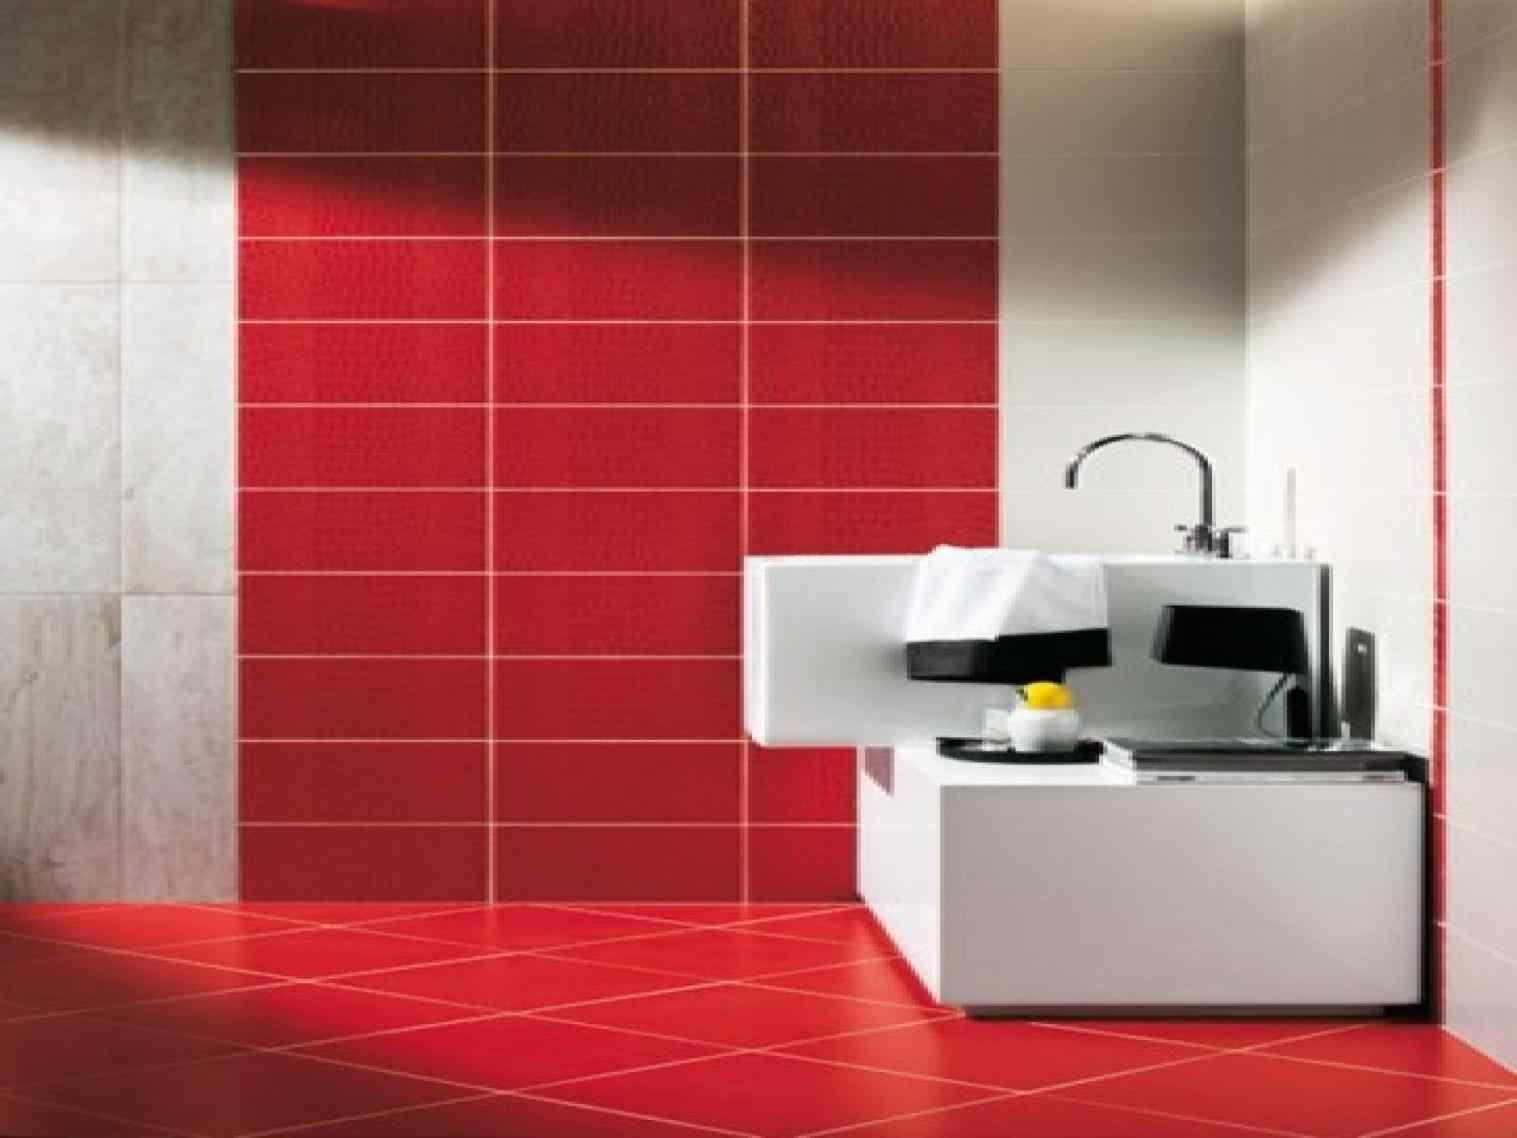 Top And Amazing Bathroom Tiles Design Ideas Breakpr Bathroom Wall Tile Design Bathroom Red Modern Bathroom Tile